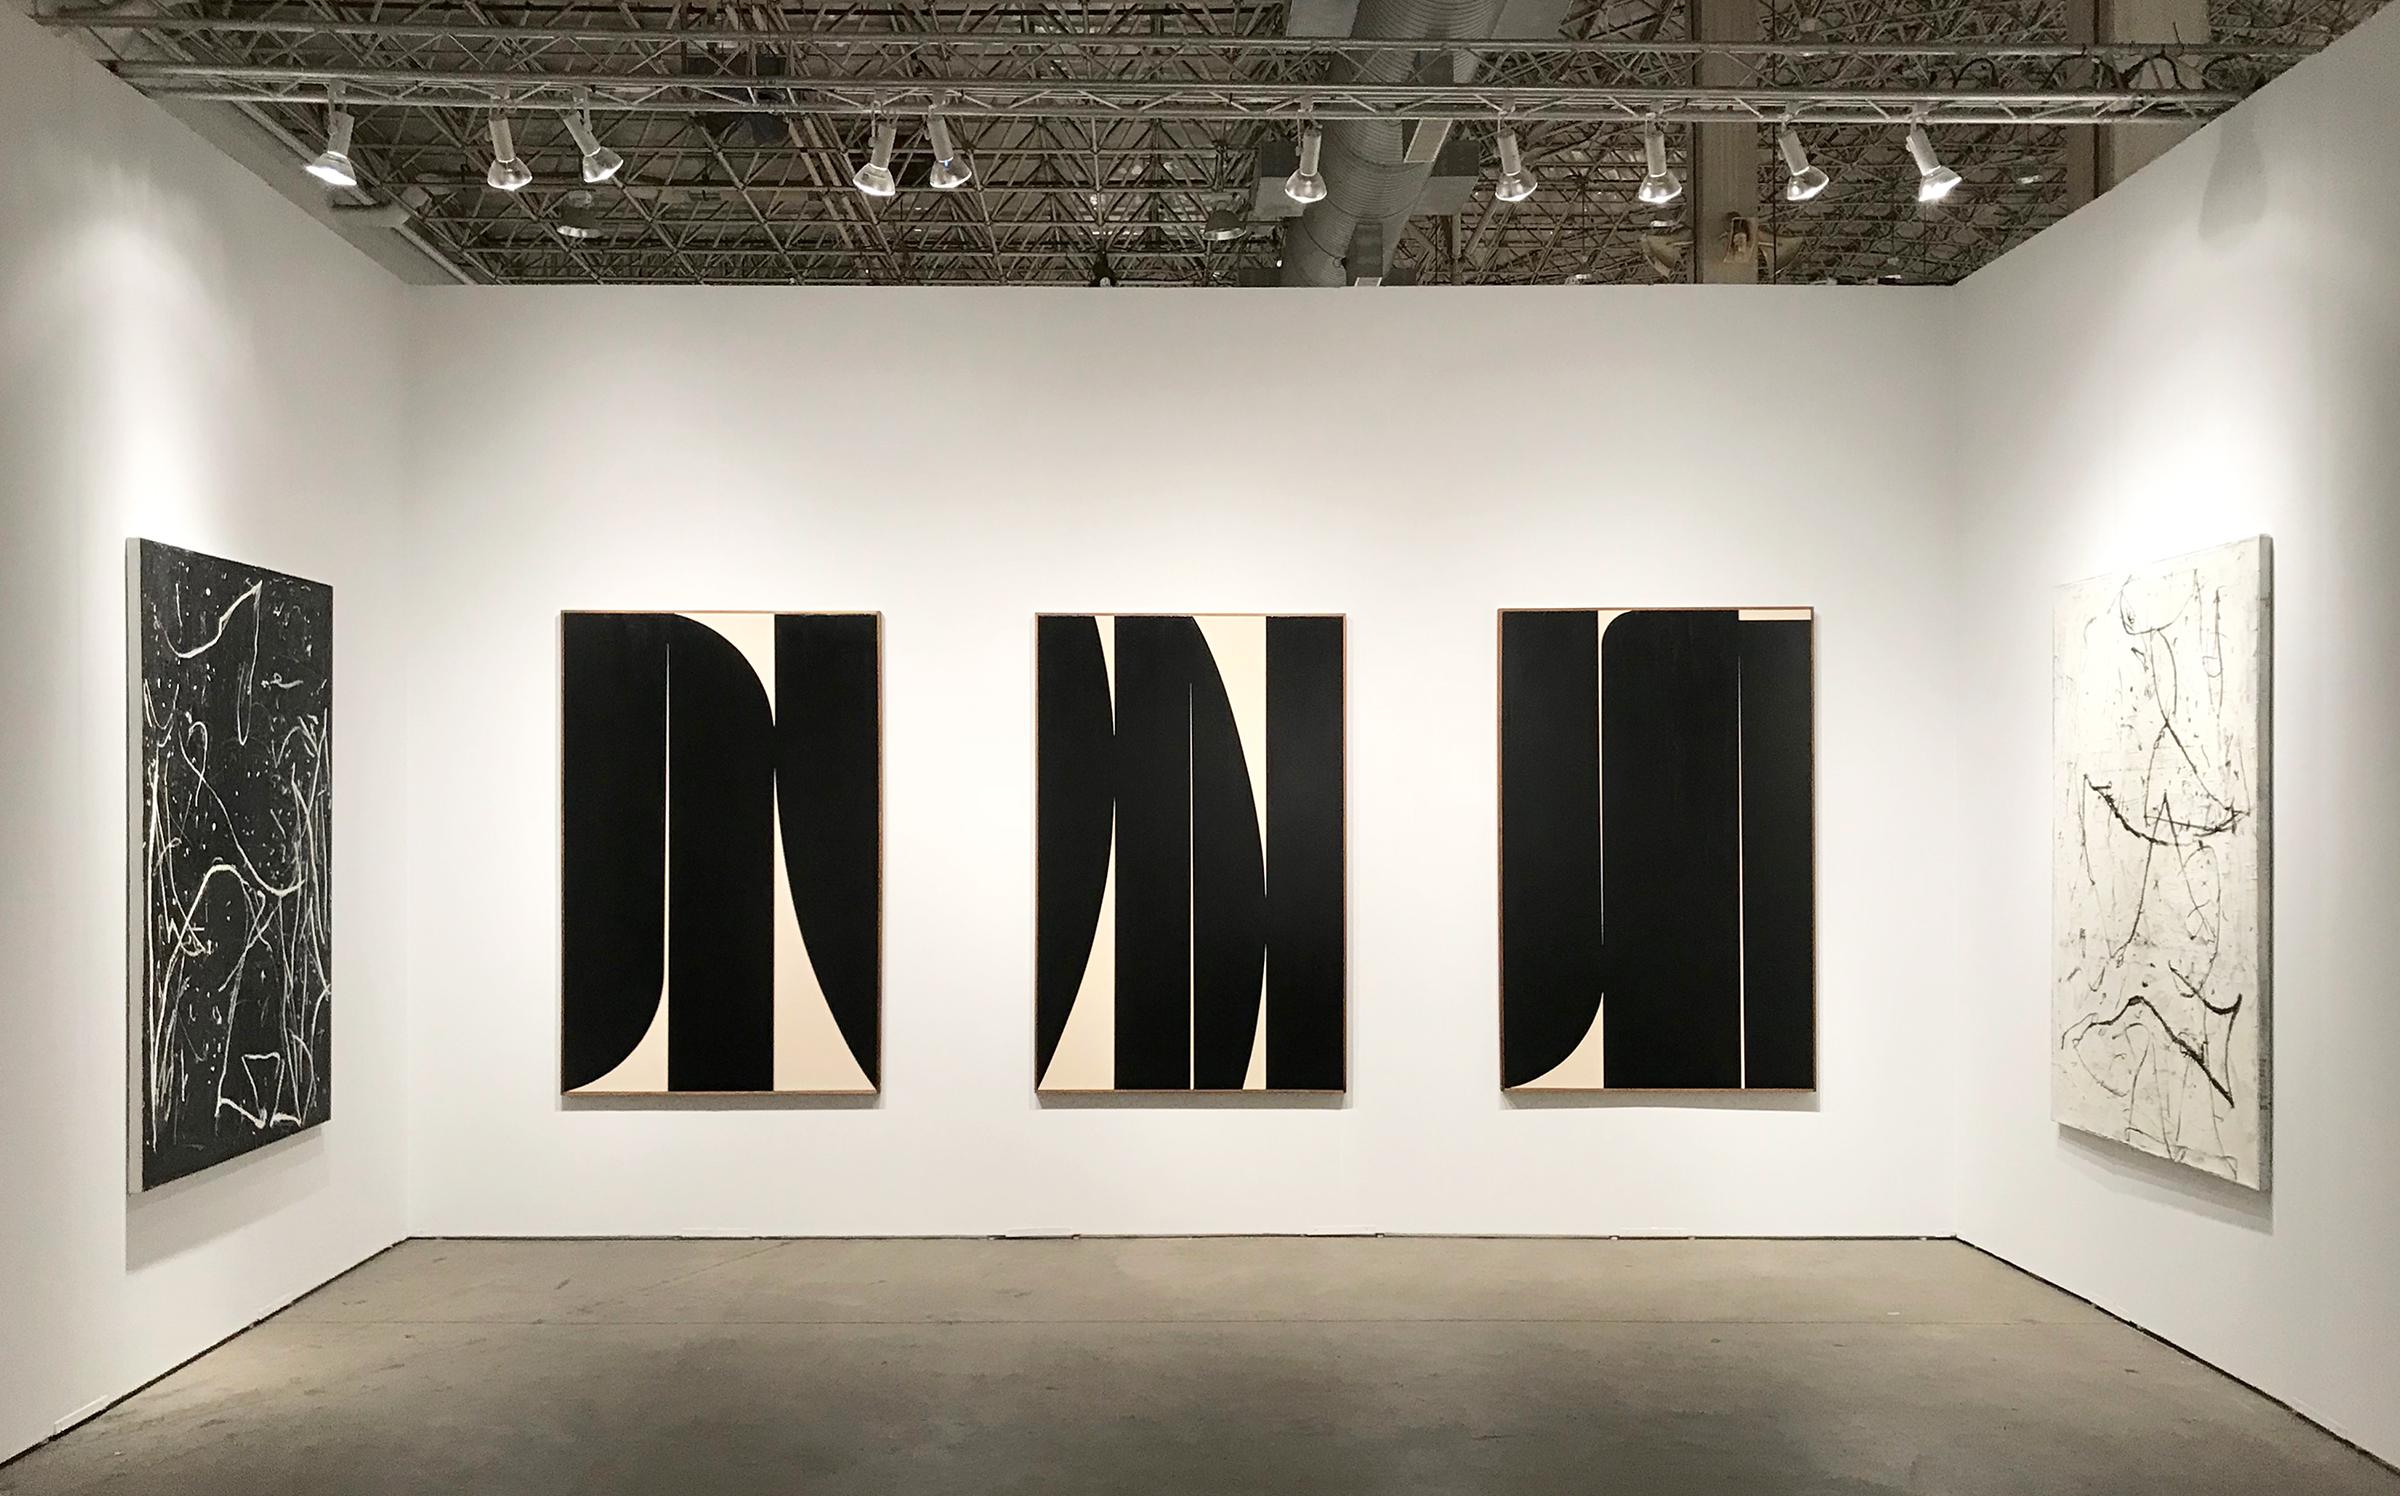 EXPO Chicago Featuring: Johnny Abrahams & Joseph Hart, installation